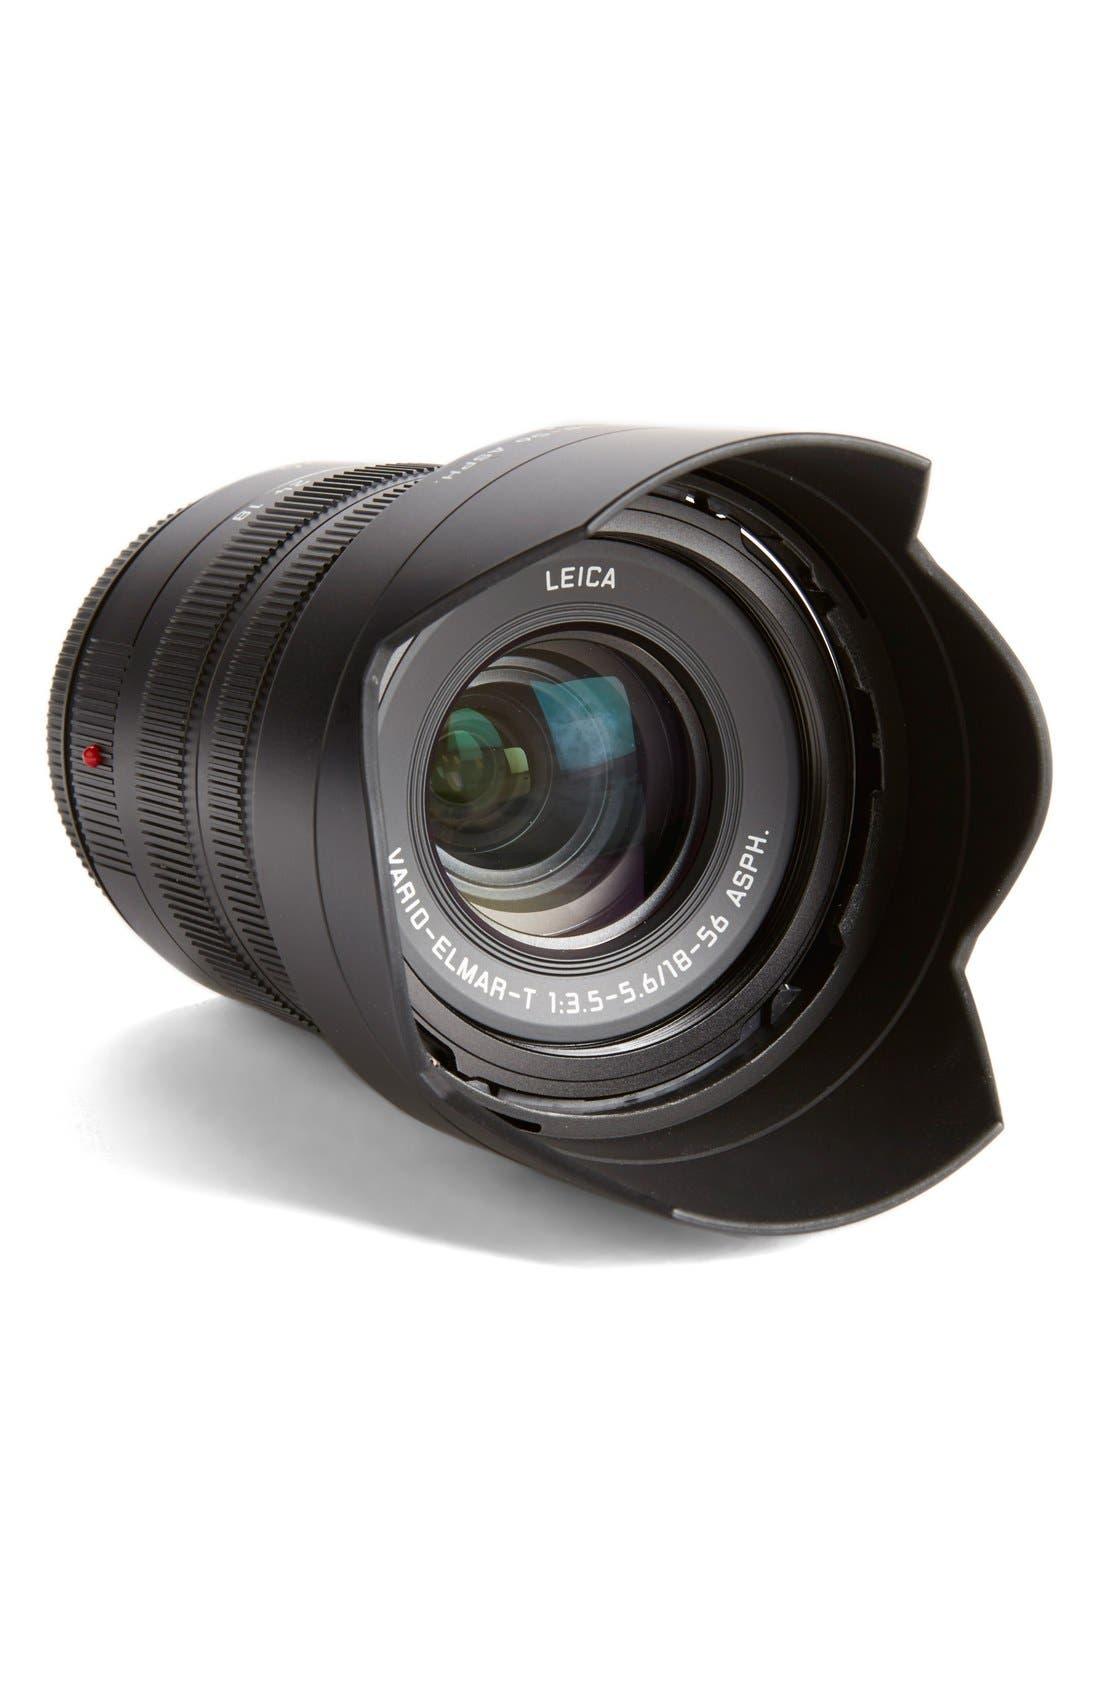 'Vario-Elmar-T' 18-56mm f / 3.5 - 5.6 ASPHLens,                             Alternate thumbnail 2, color,